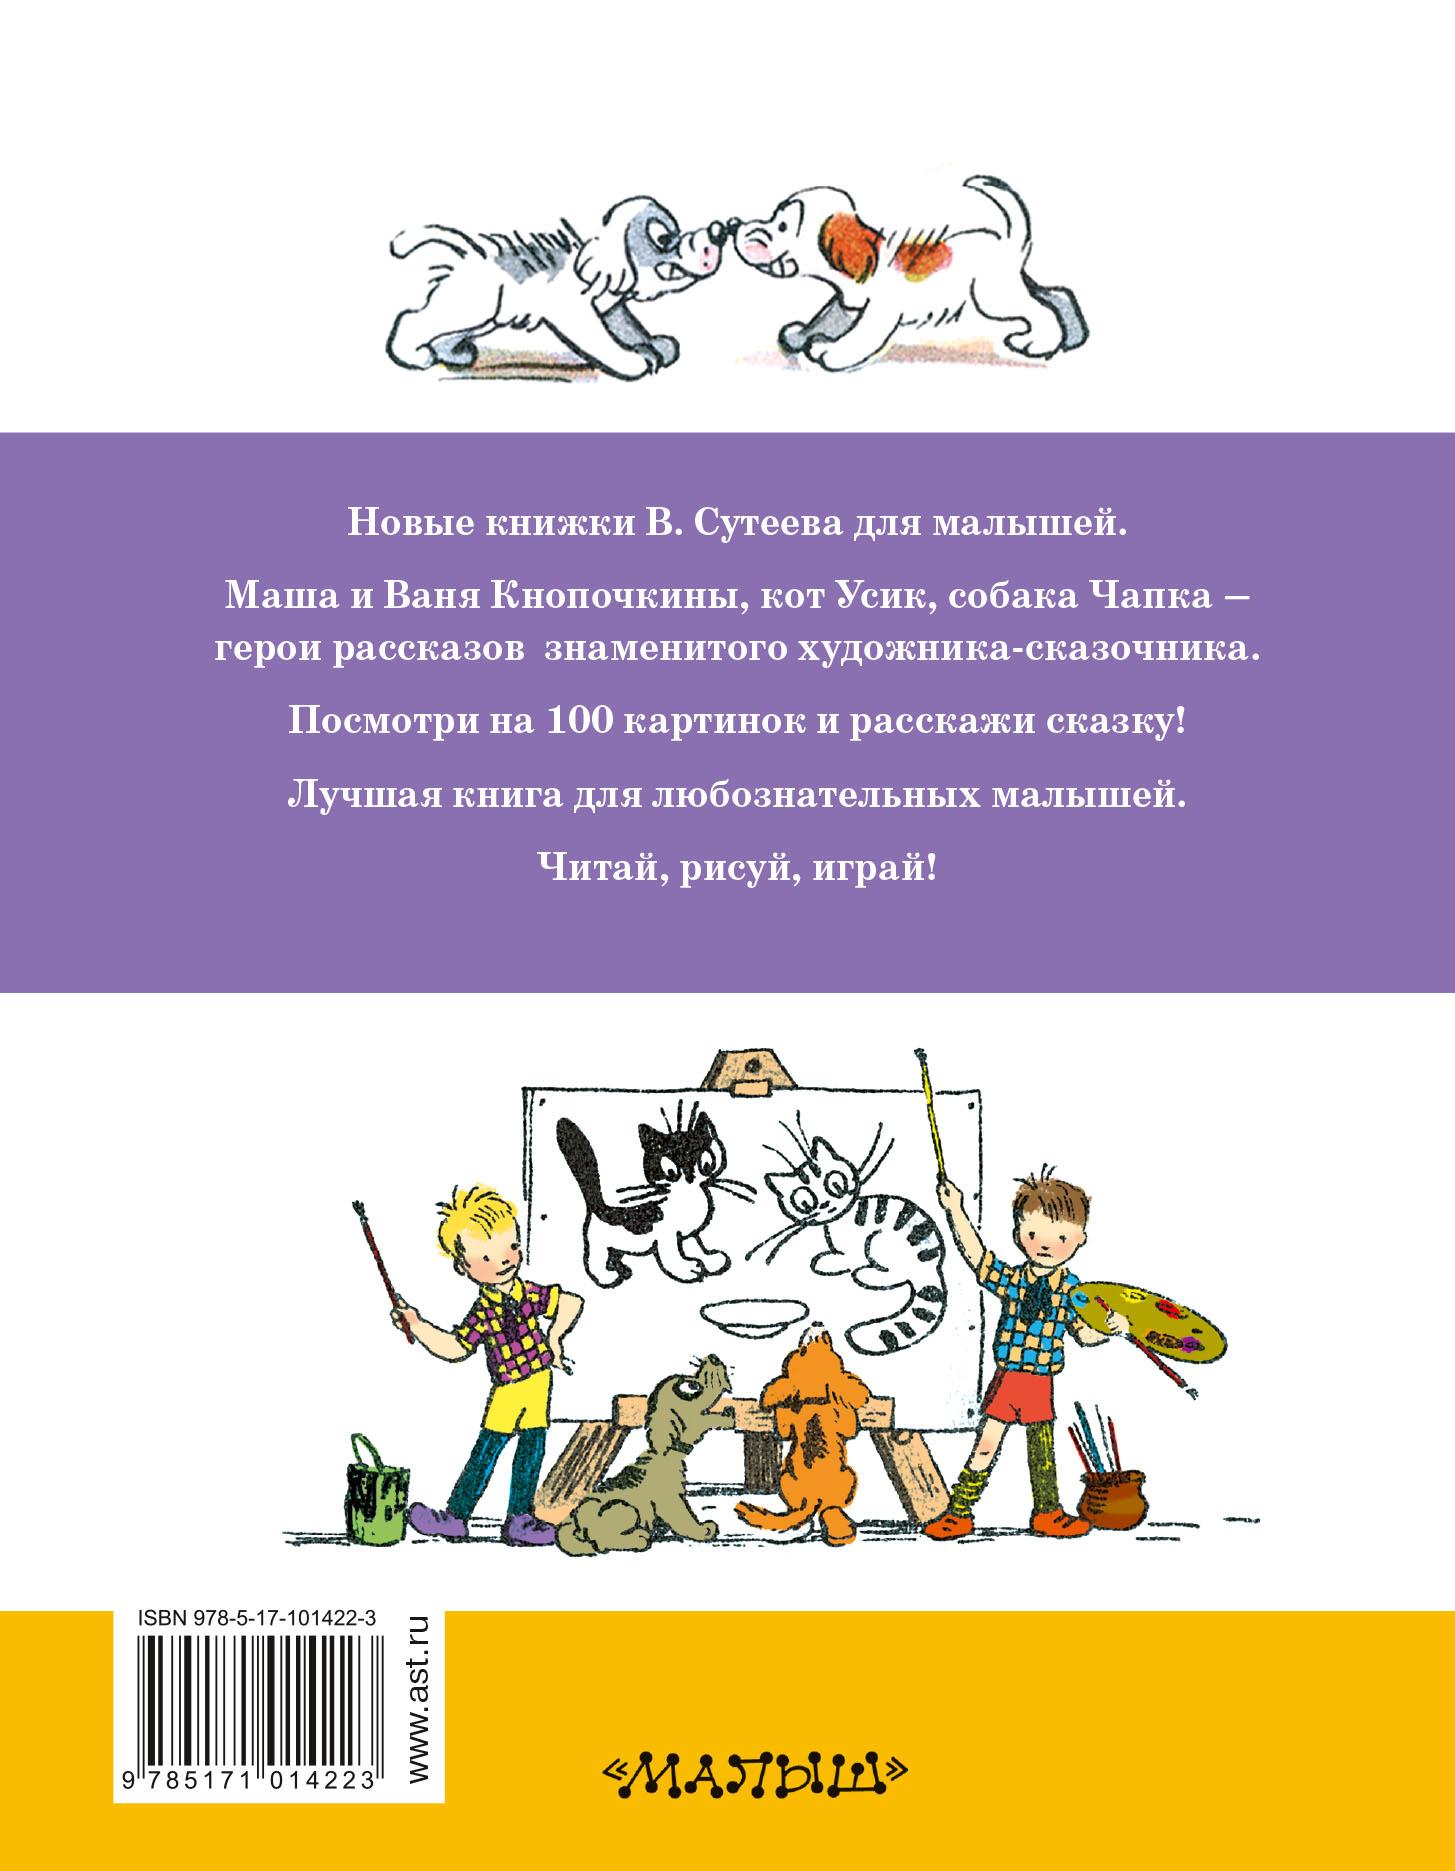 Сутеев Владимир Григорьевич. 100 картинок